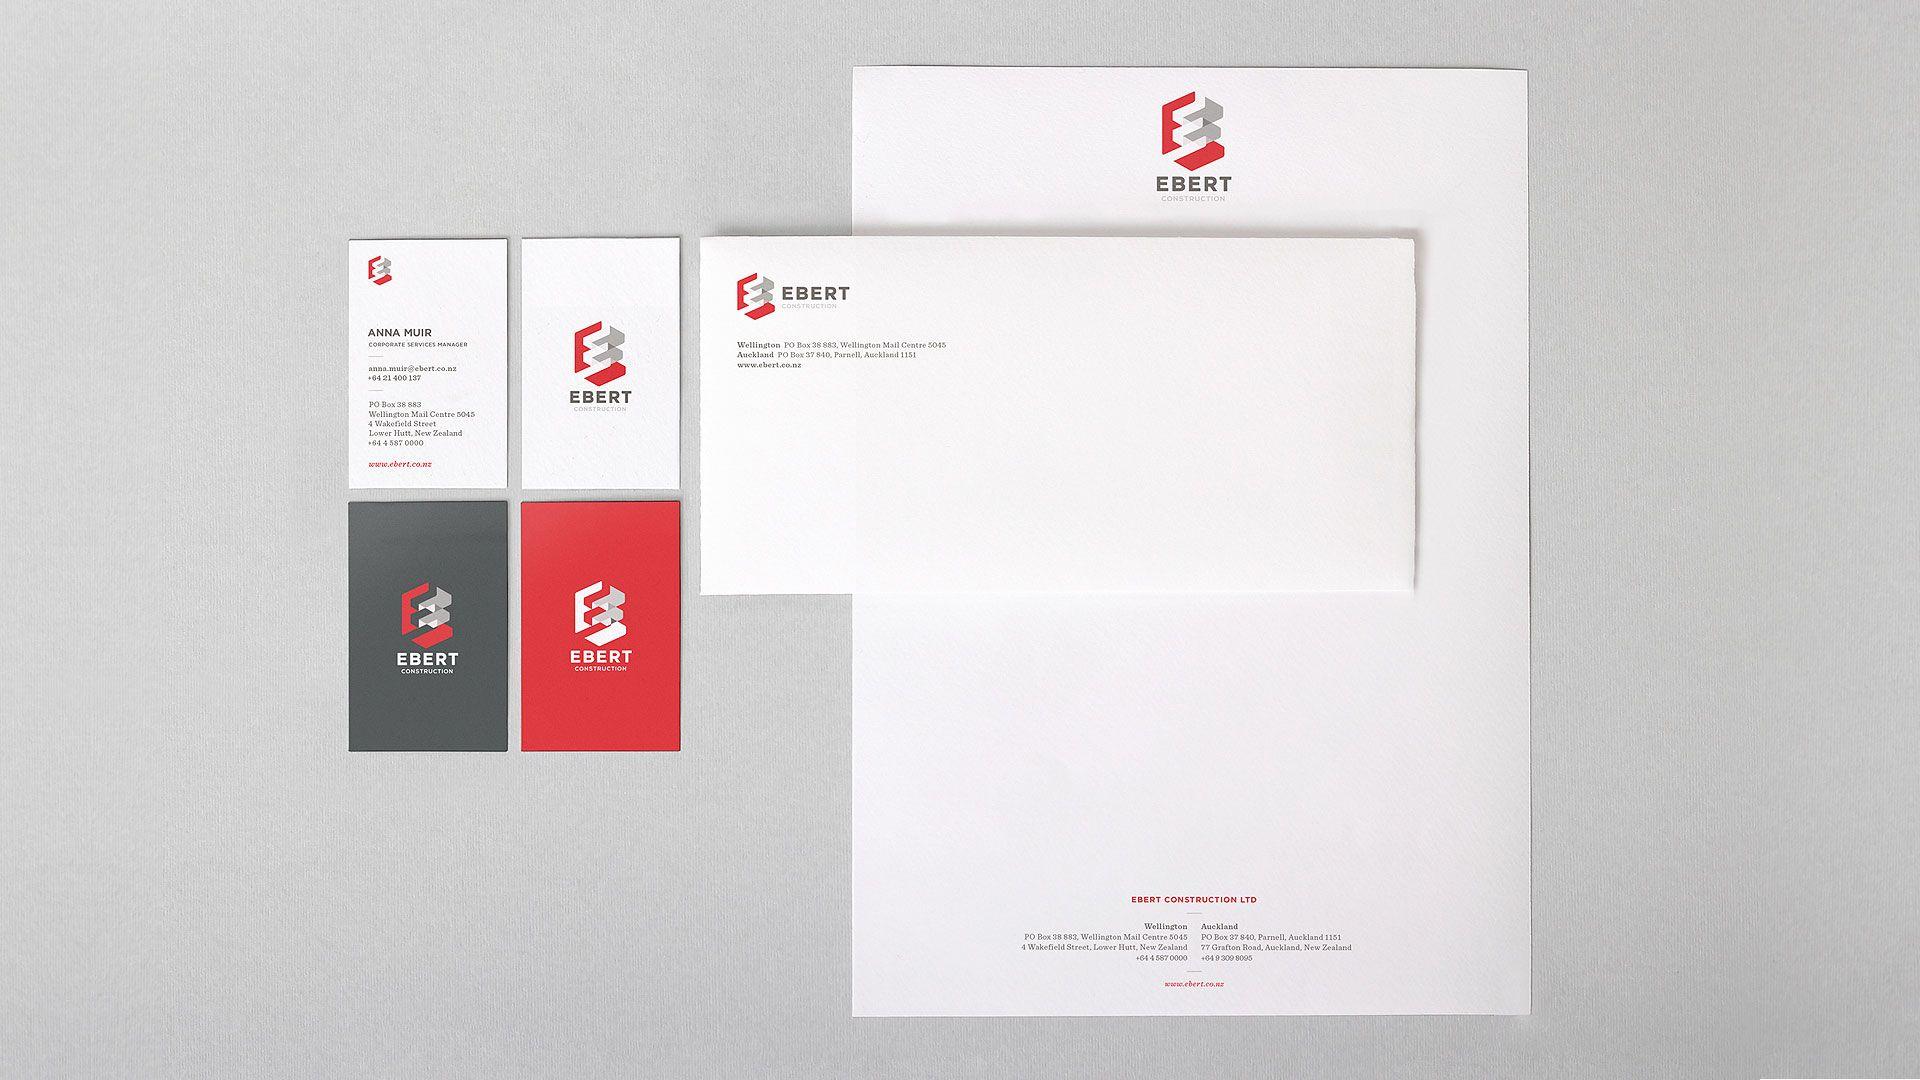 ebert, building, construction, business card, brand rejuvenation ...